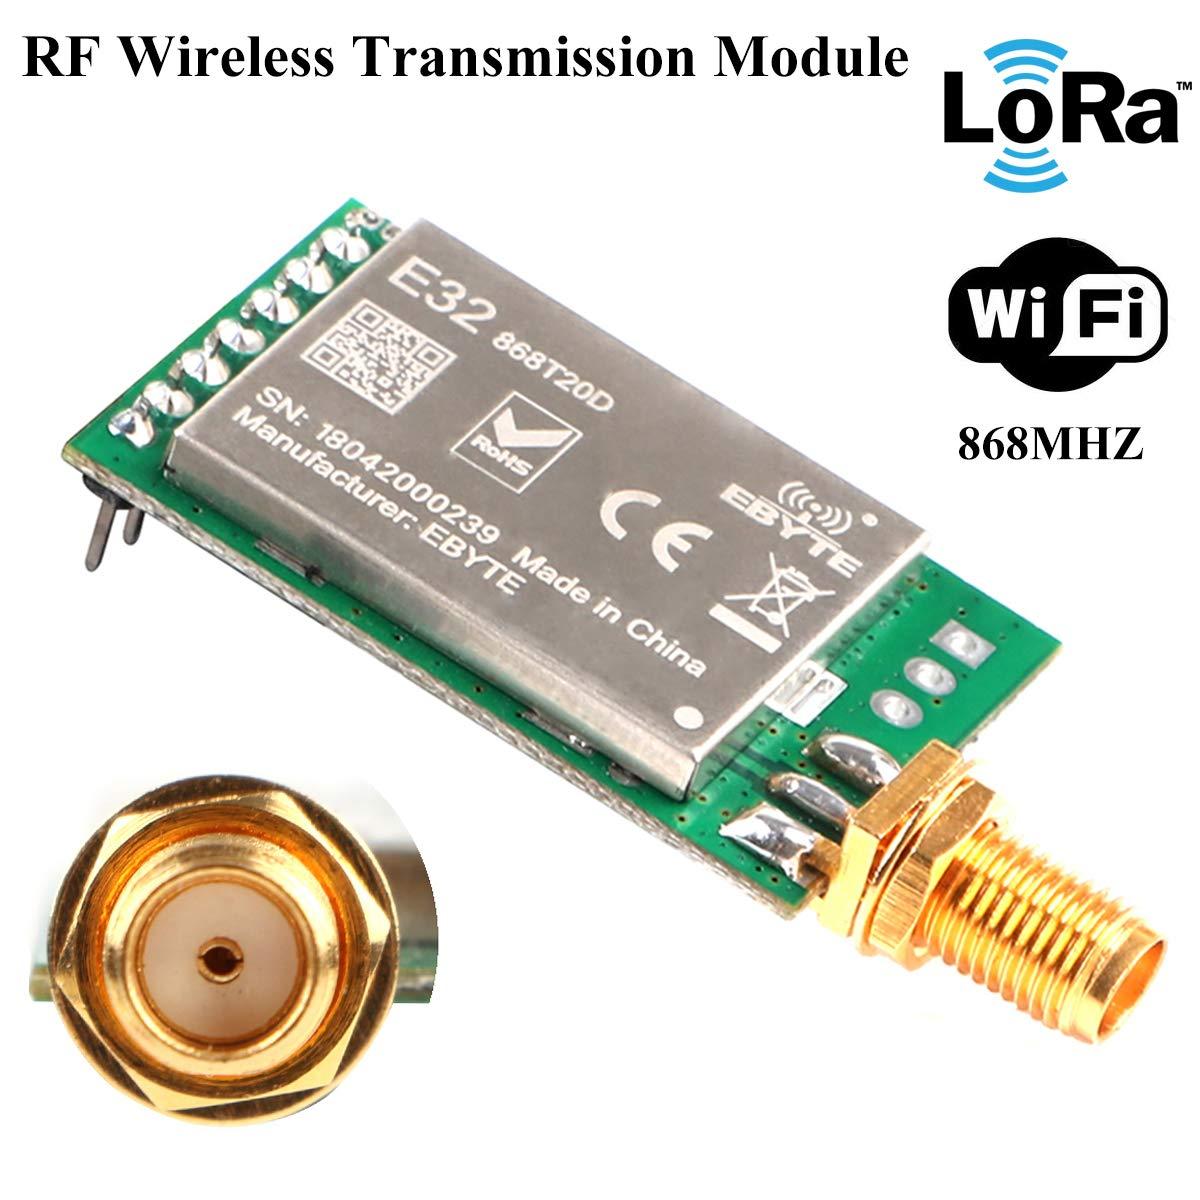 MakerHawk RF Wireless Transmission Module 868 MHZ LoRa Spread-spectrum Communication, 20dBm 100mW Measured Distance 3000M UART SX1276 RF Receiver Transmitter, Super Anti-interference Performance